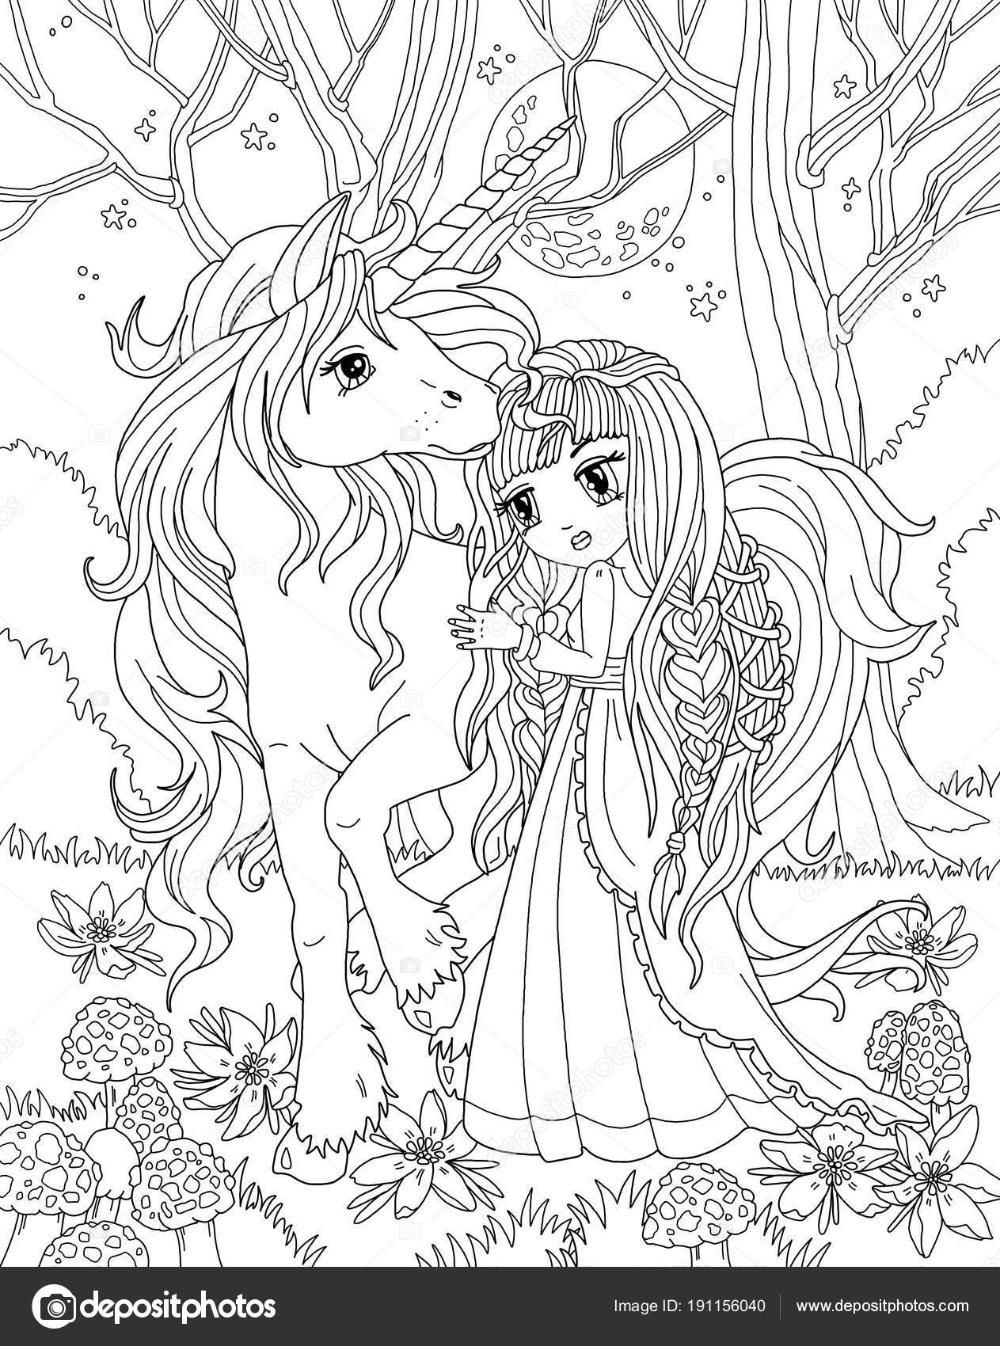 Coloriage Licorne Princesse — Photographie larisakuzovkova  en